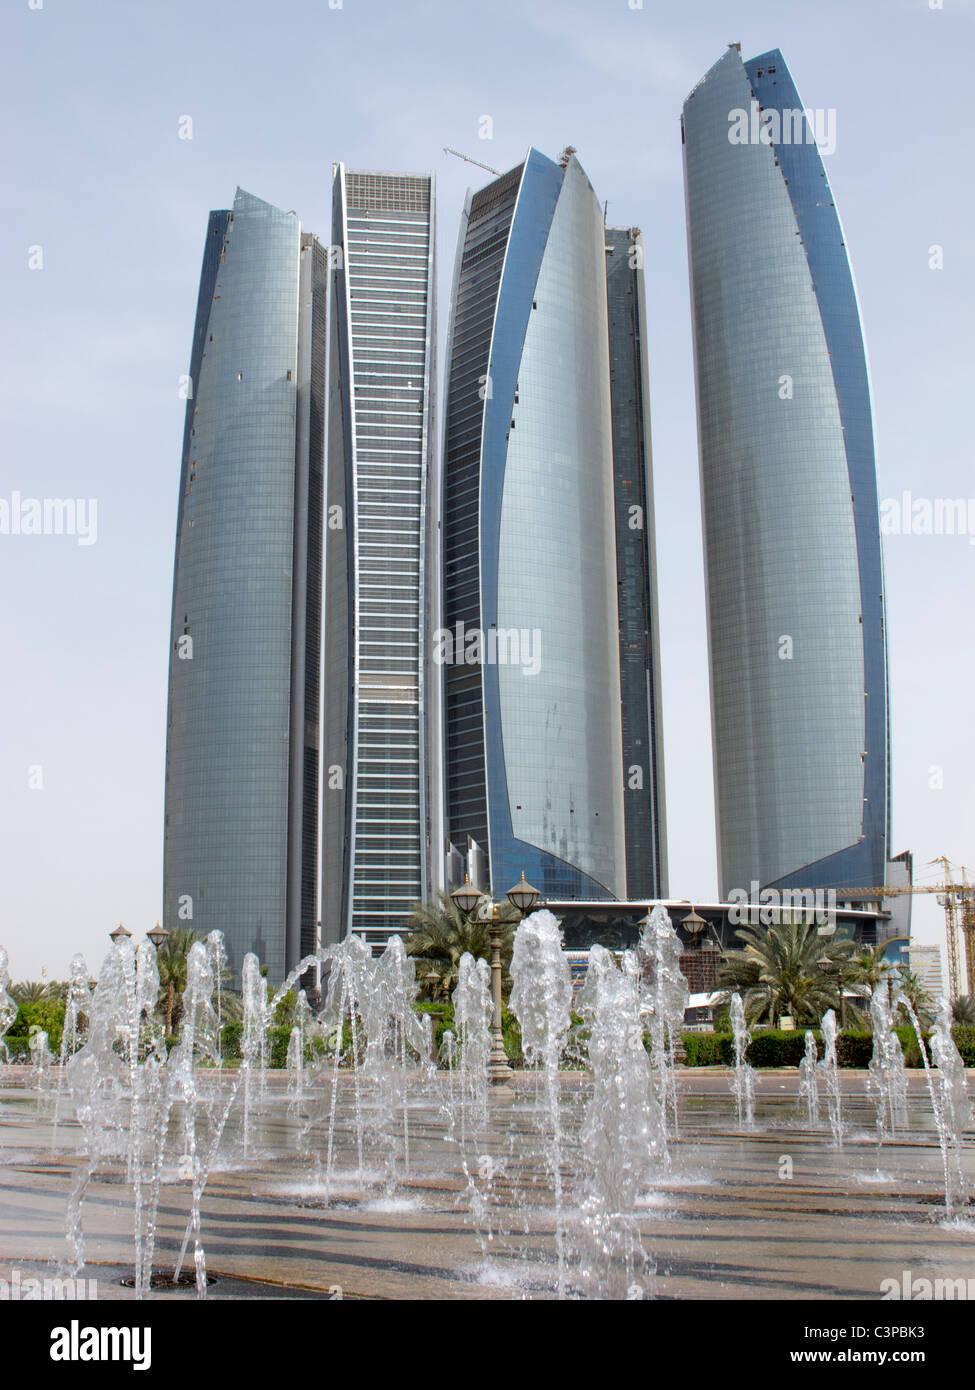 Modern high rise Etihad towers in Abu Dhabi United Arab Emirates UAE - Stock Image